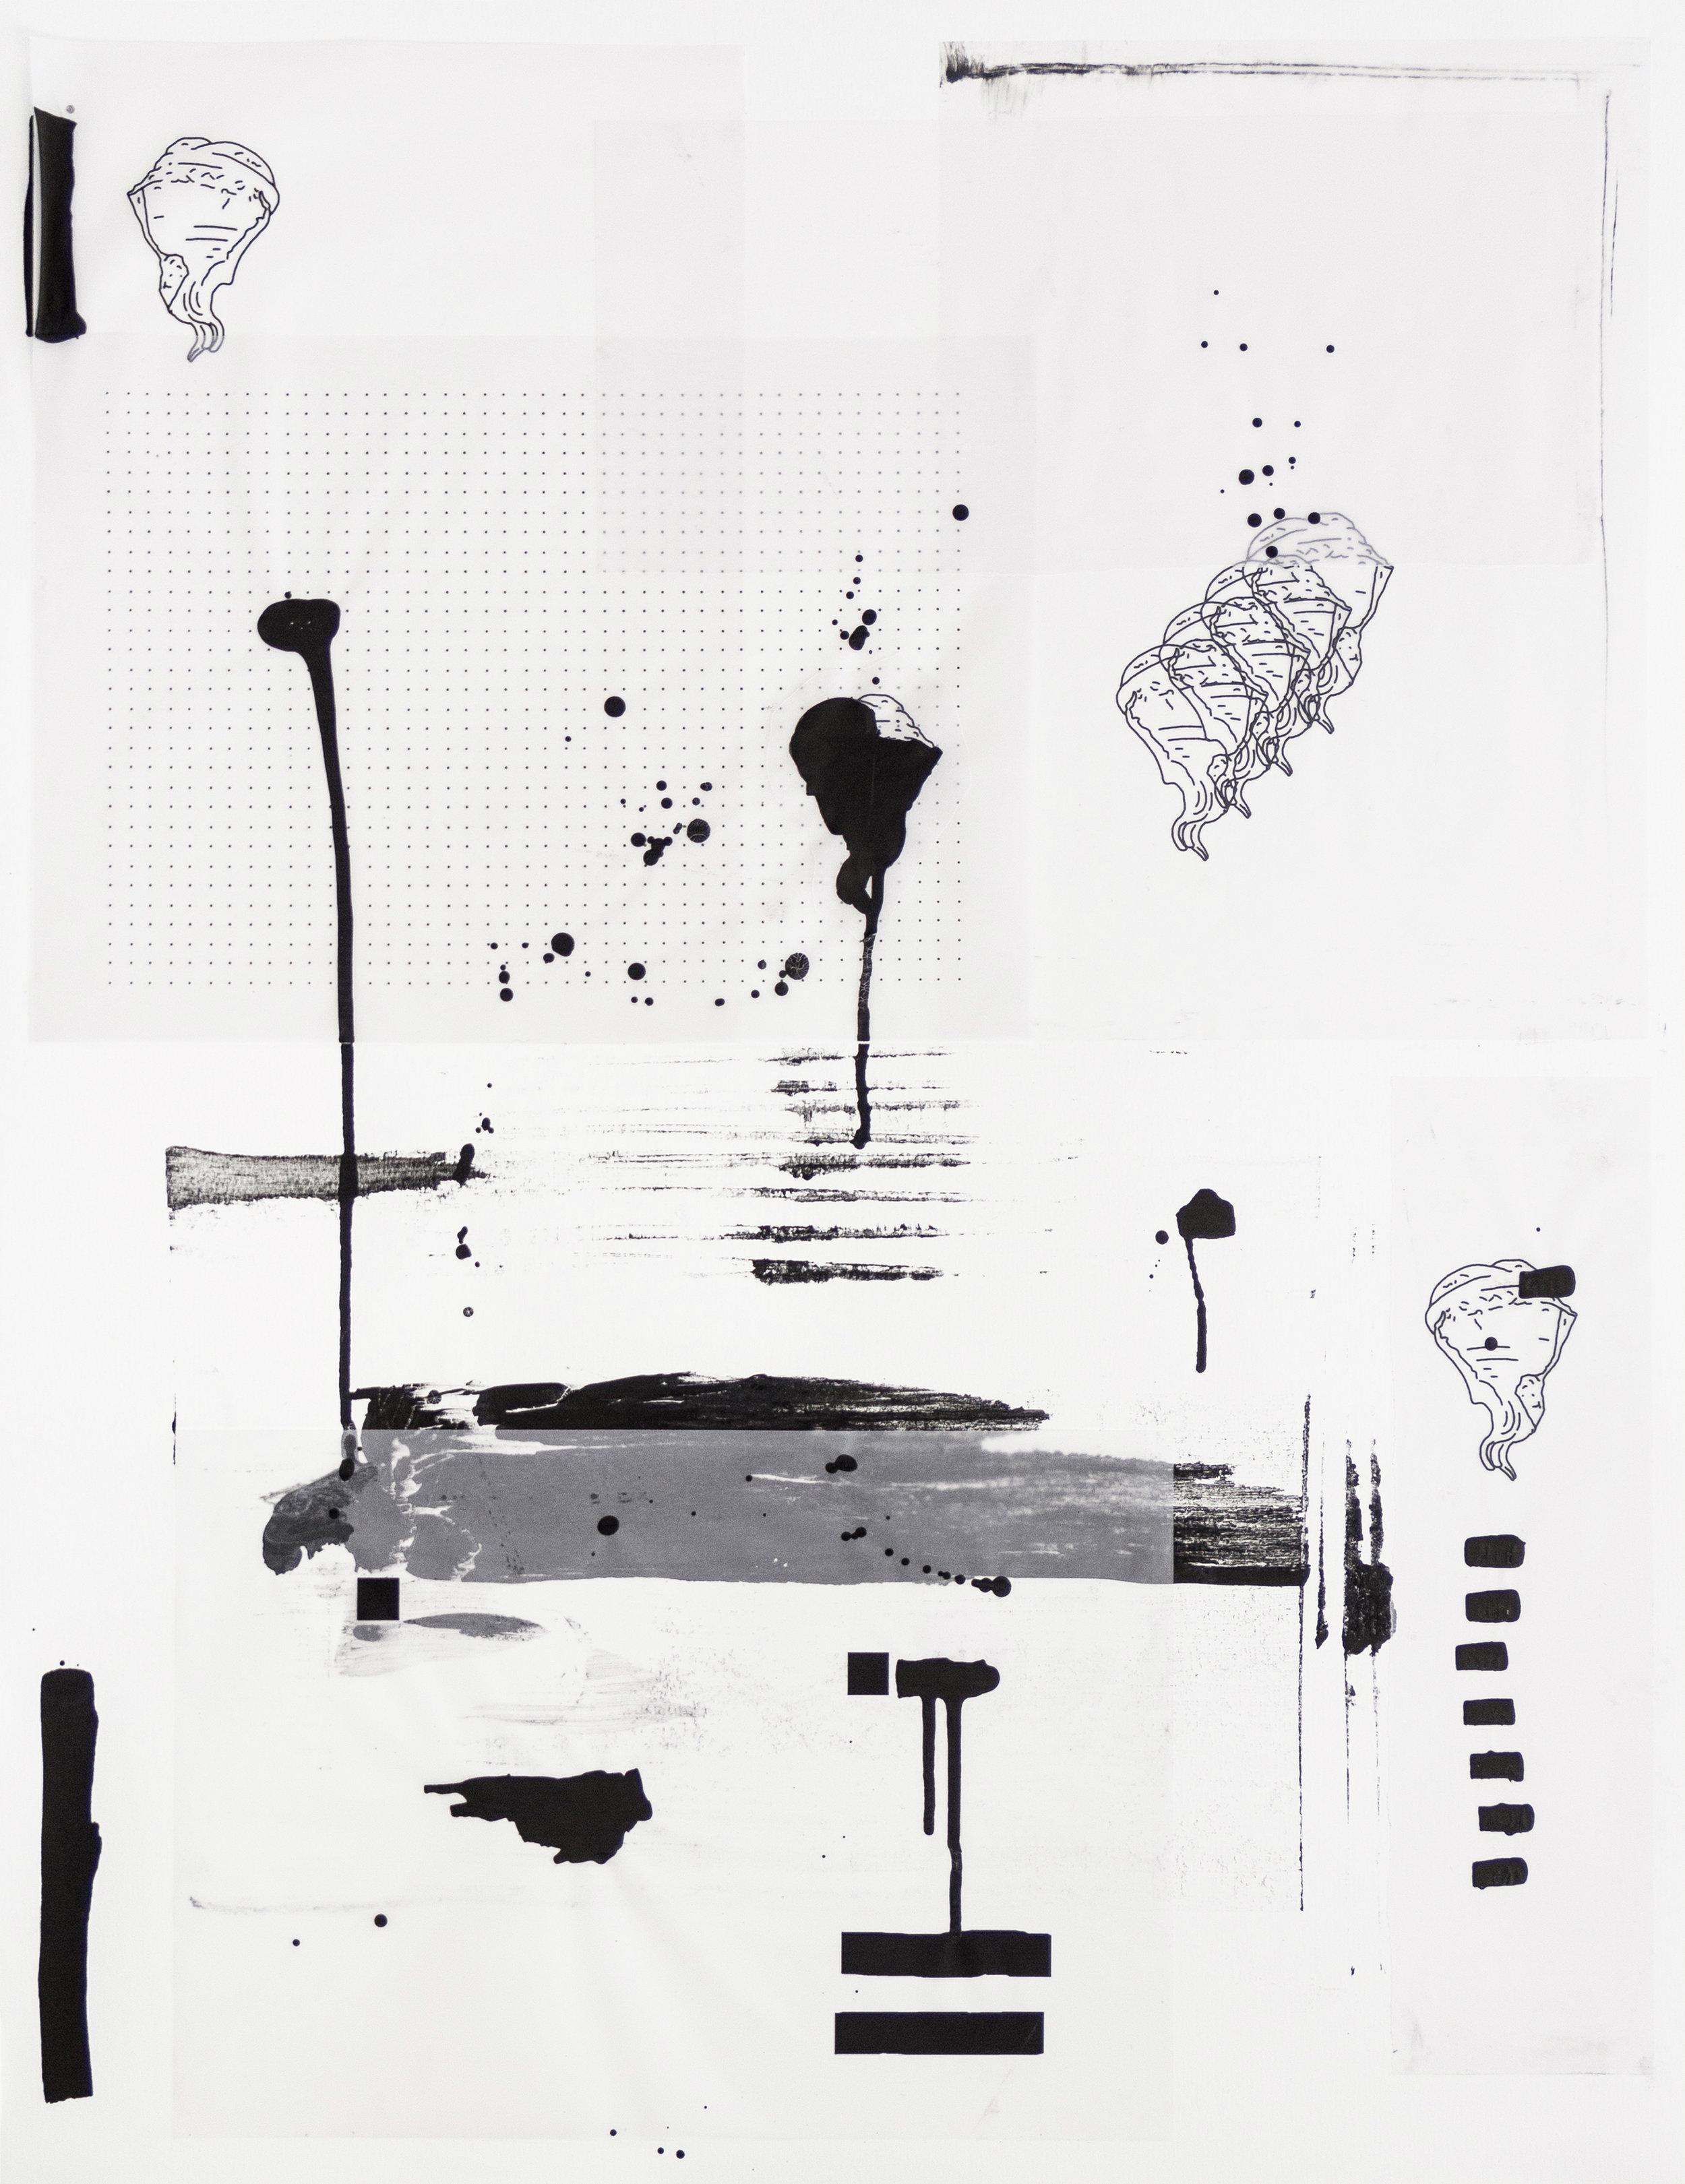 %22Detrás del espejo _ 18%22 - Papel transparente, pegamento, inkjet, tinta acrílica sobre papel Canson - 65 x 50 cm - Julián Brangold - 2018.jpg